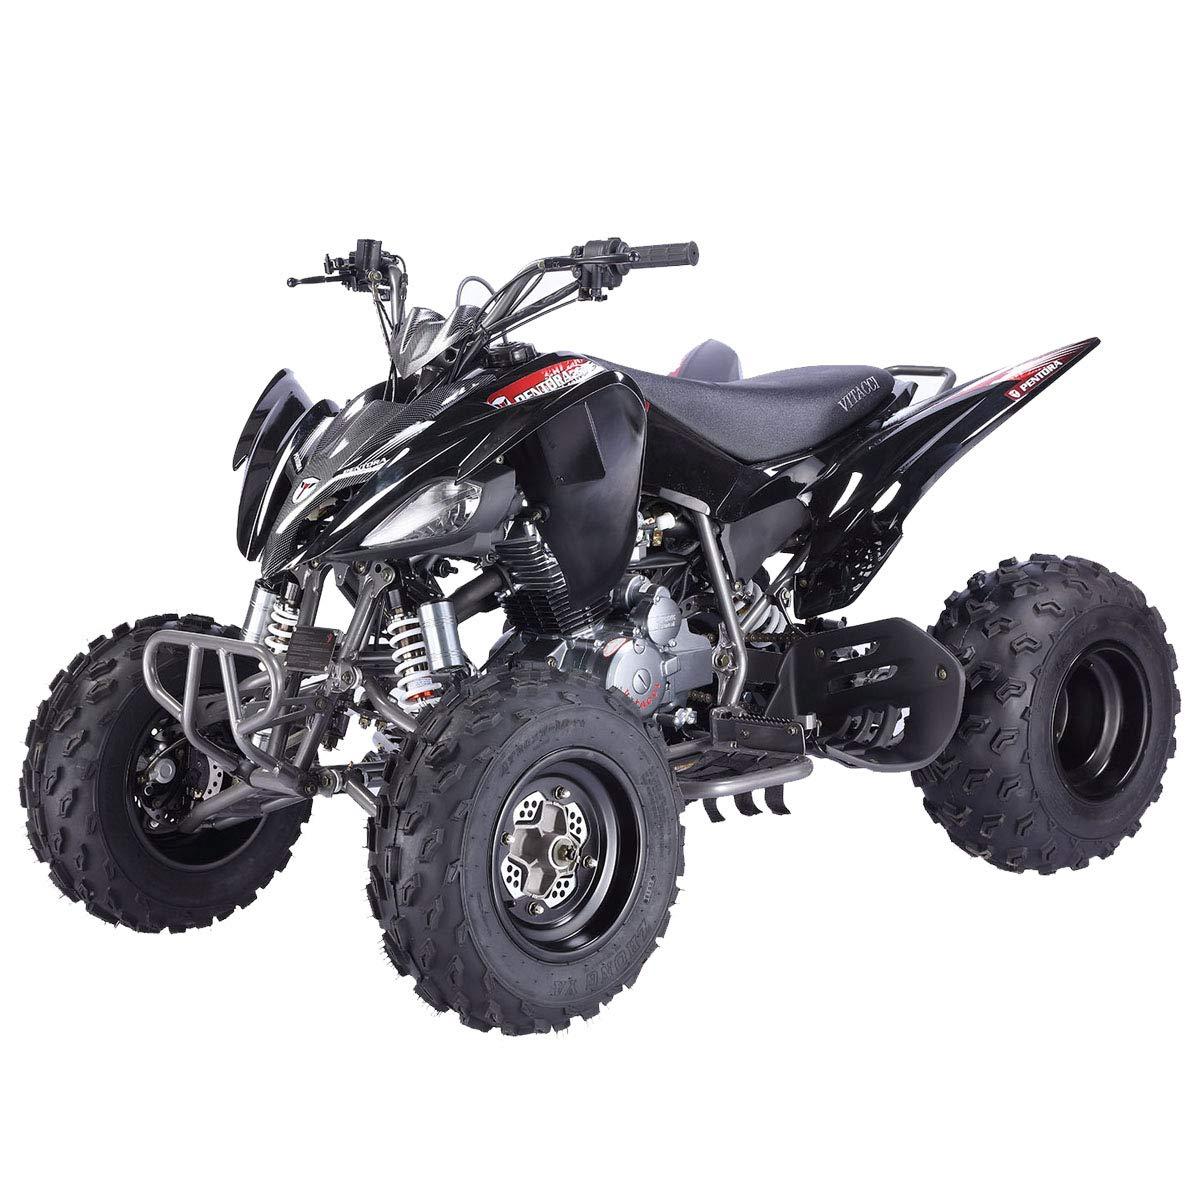 X-Pro 150cc ATV Quad Utility Full Size ATVs Quads 150cc 4 Wheeler Adult ATV with Gloves Goggle and Handgrip